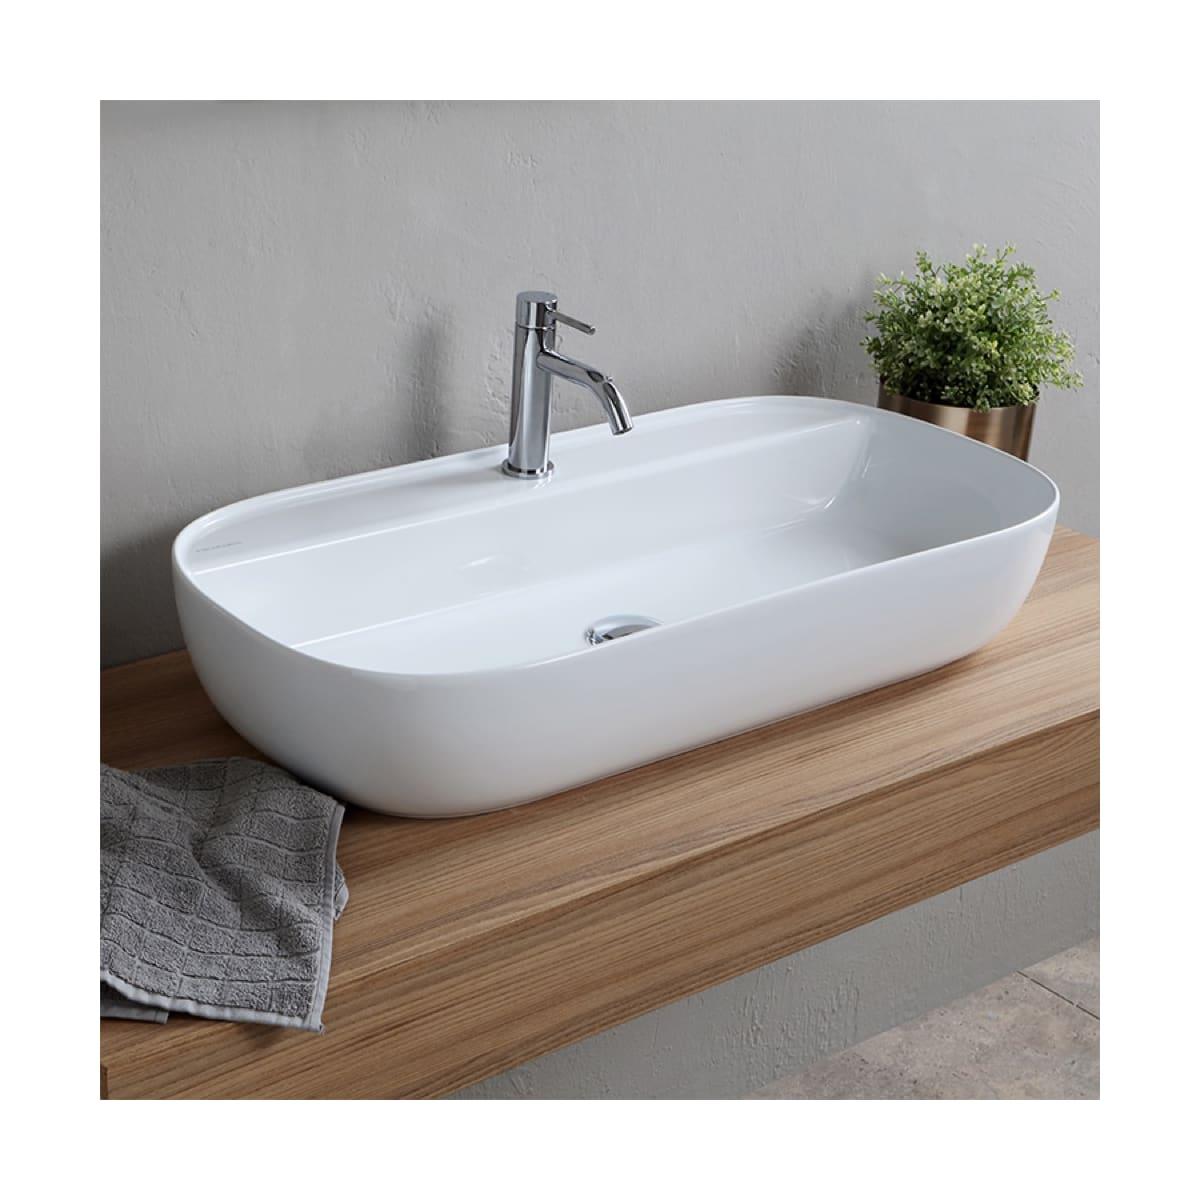 Nameeks Scarabeo 1801 Three Hole White Glam 30 Rectangular Ceramic Vessel Bathroom Sink Faucetdirect Com